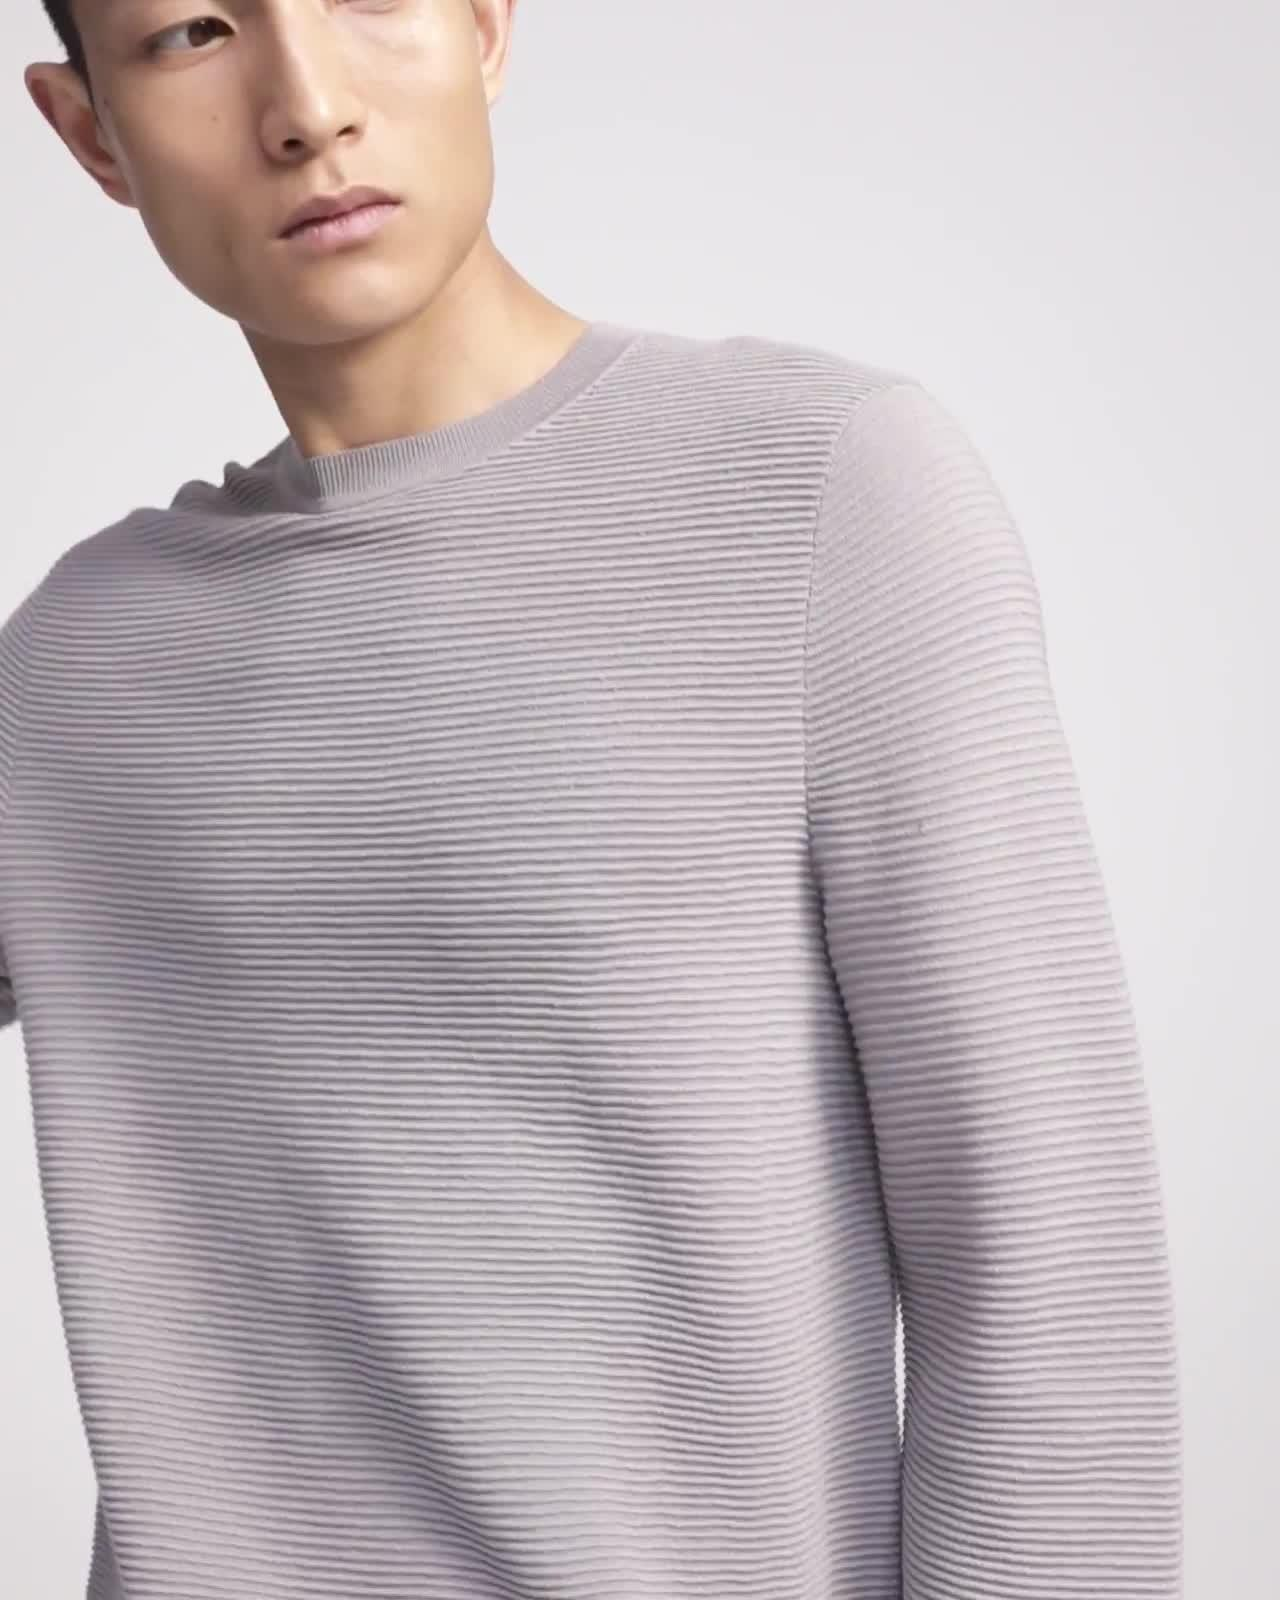 Crewneck Sweater in Washable Merino Wool